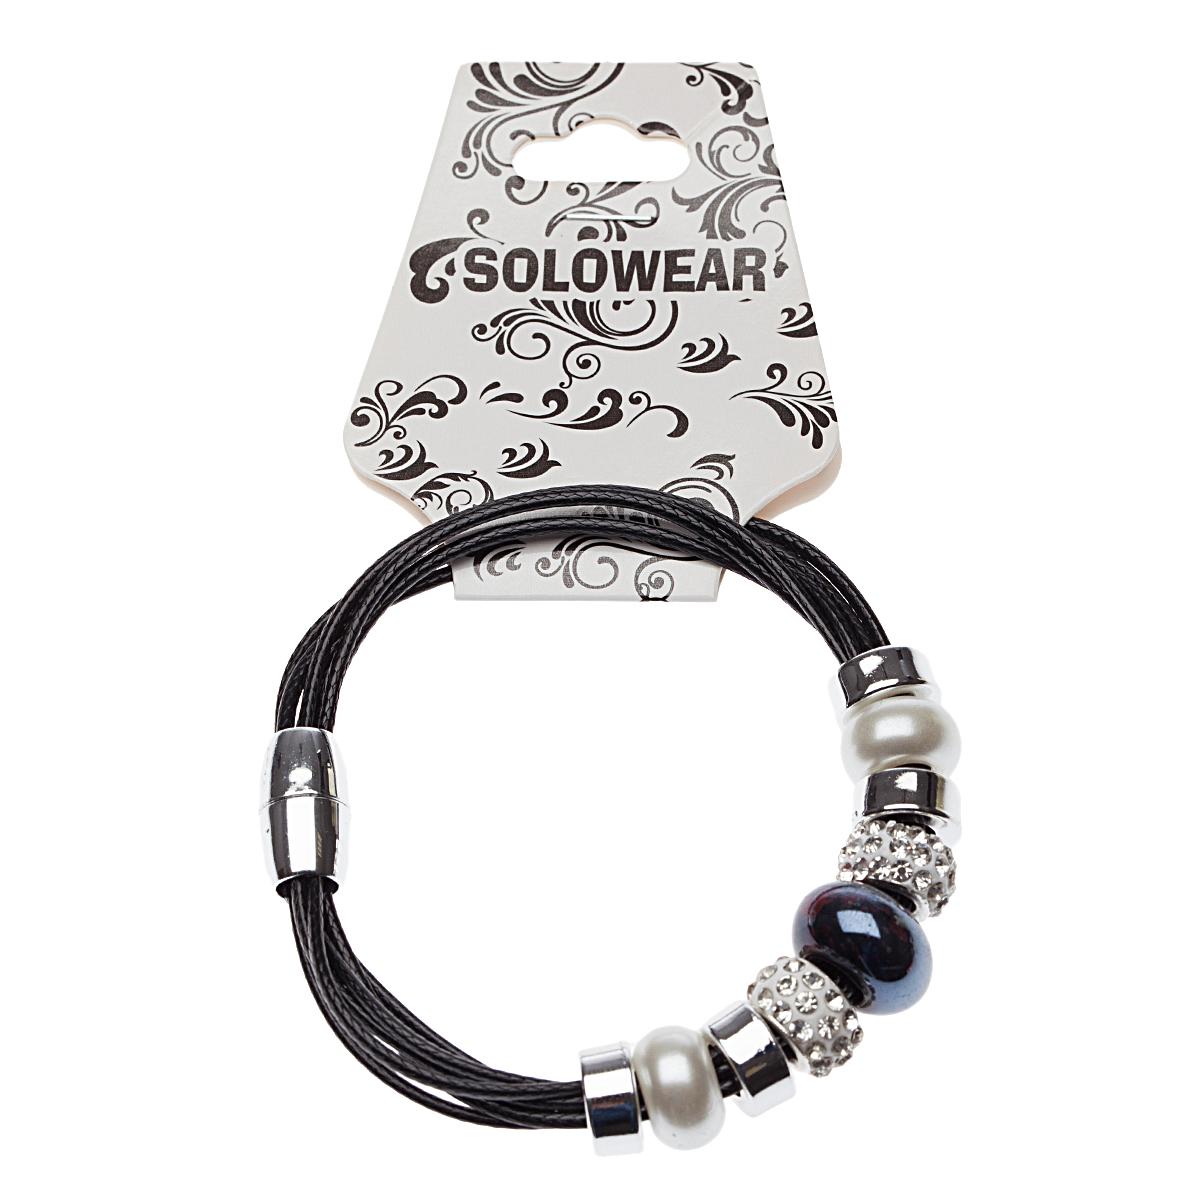 Браслет Solowear, 4620-1 браслет solowear 4620 7